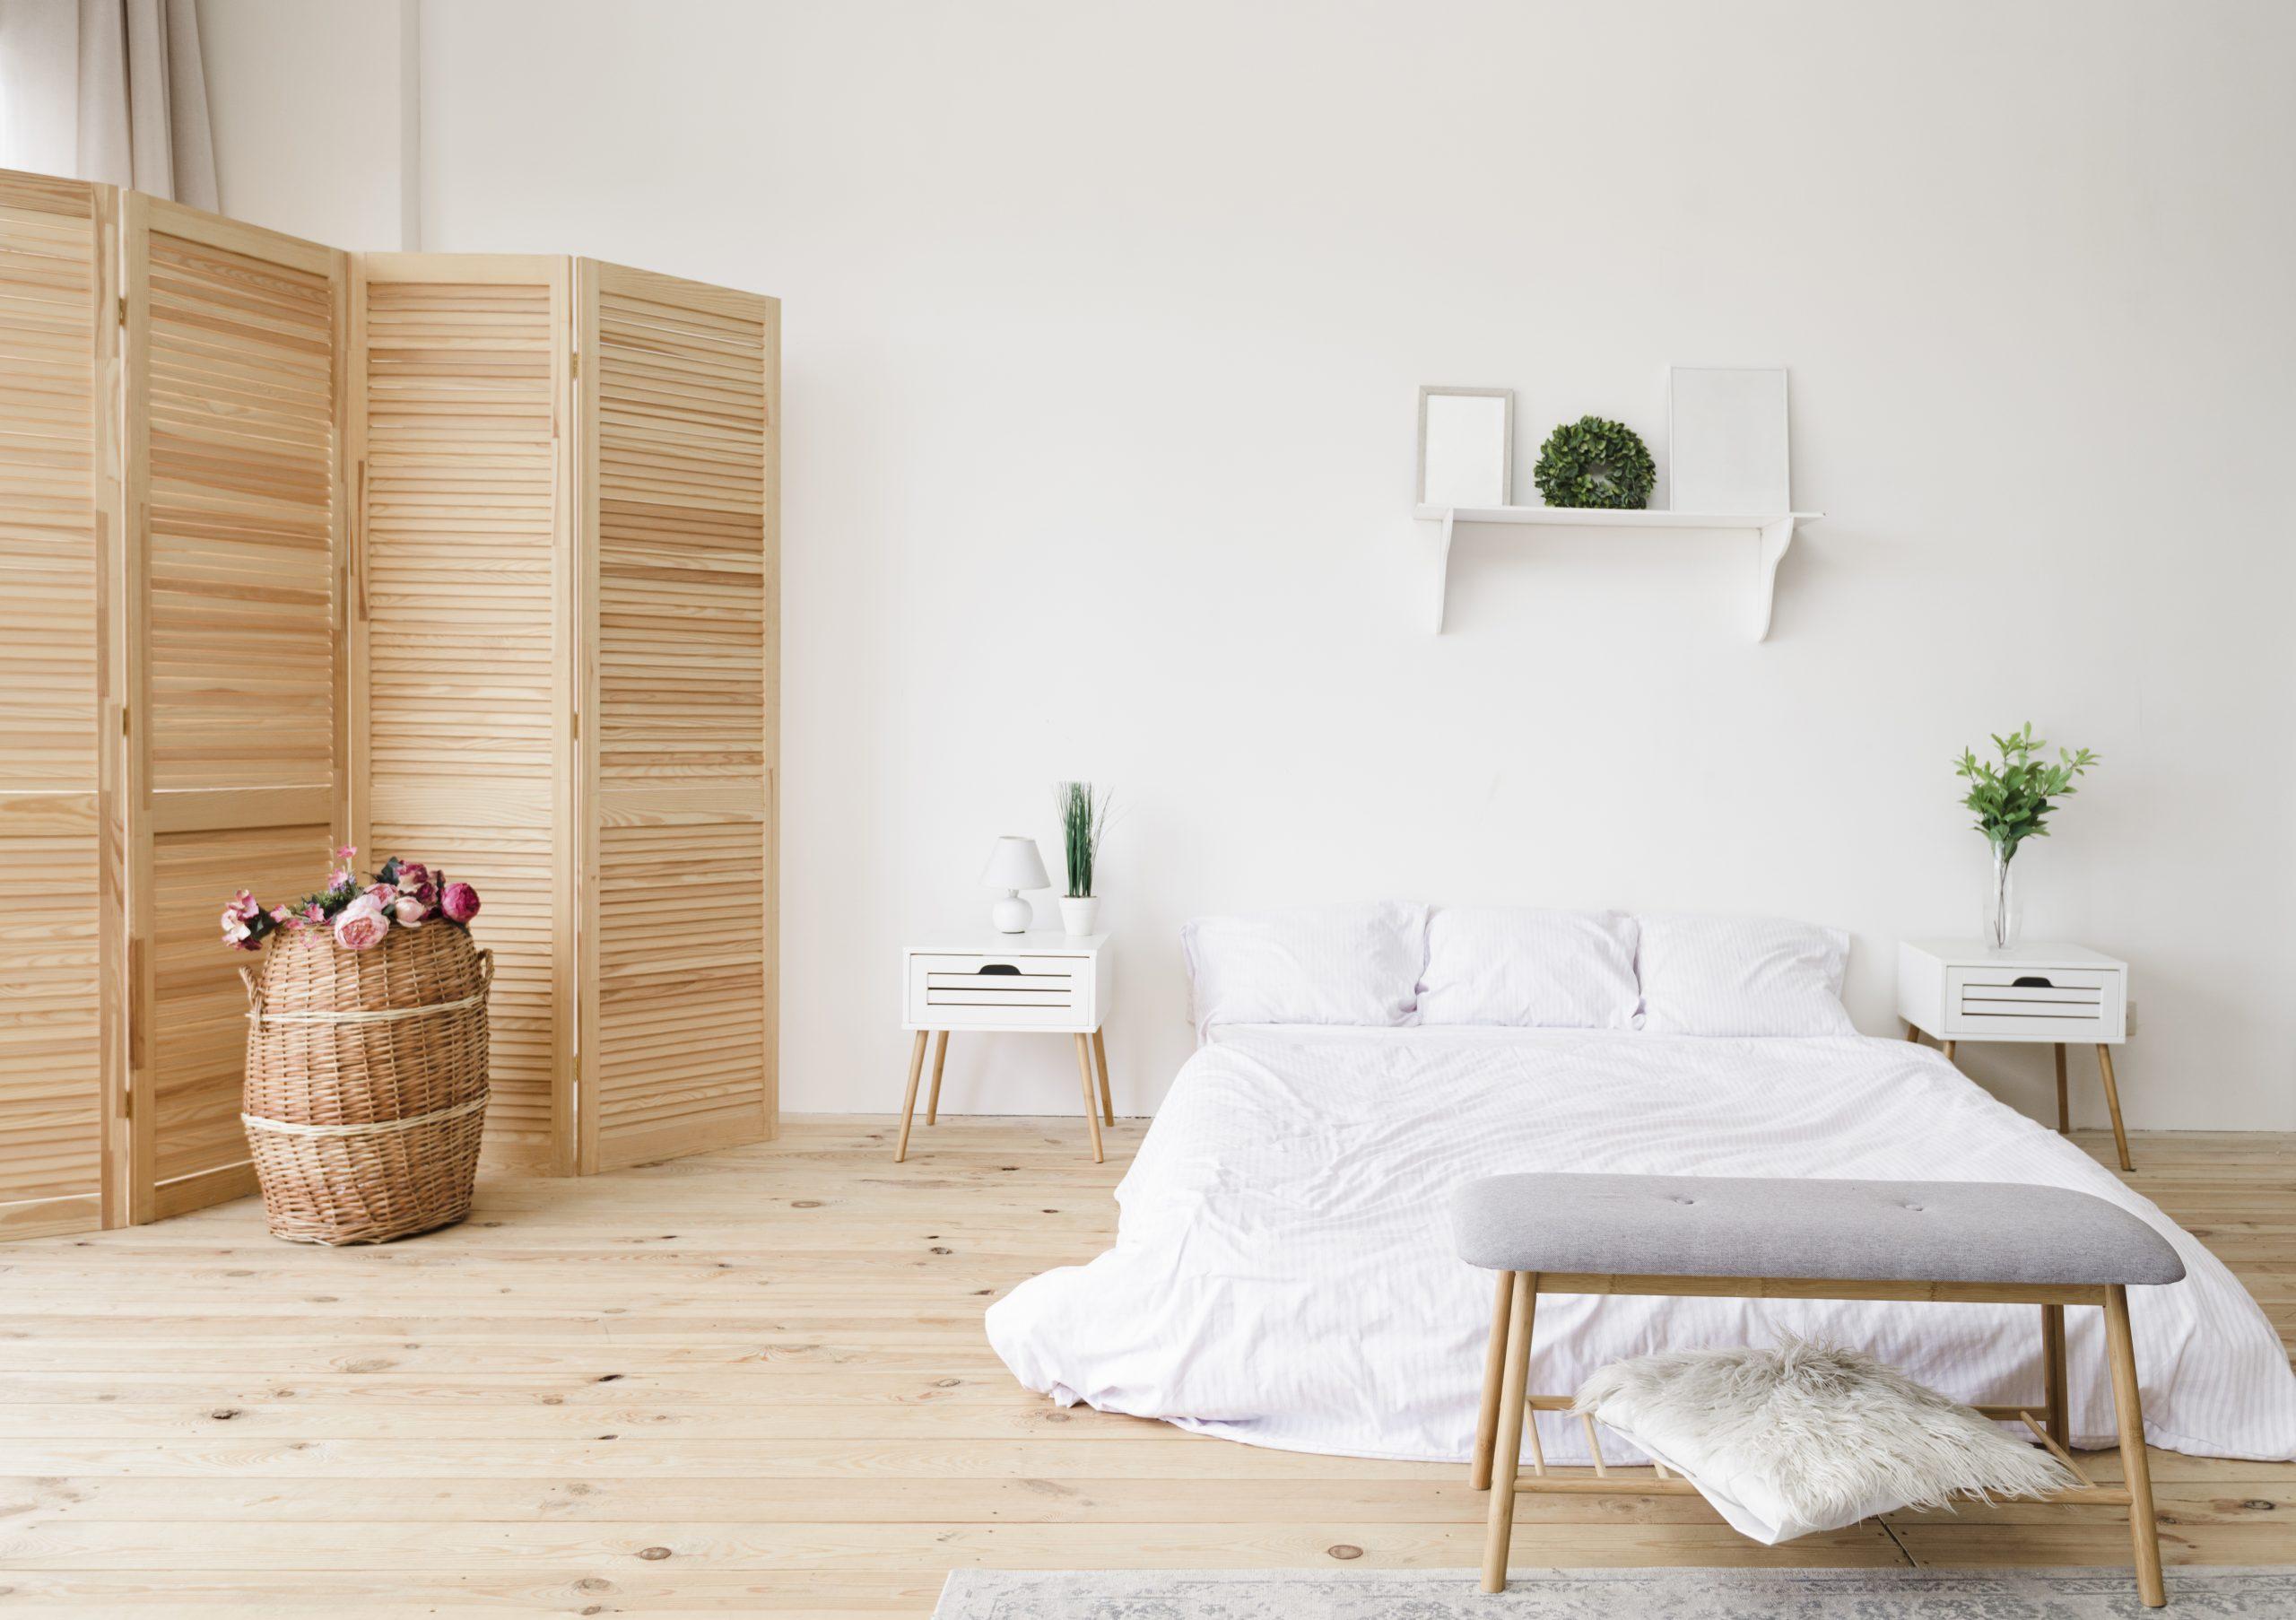 decorar dormitorio para alquilar